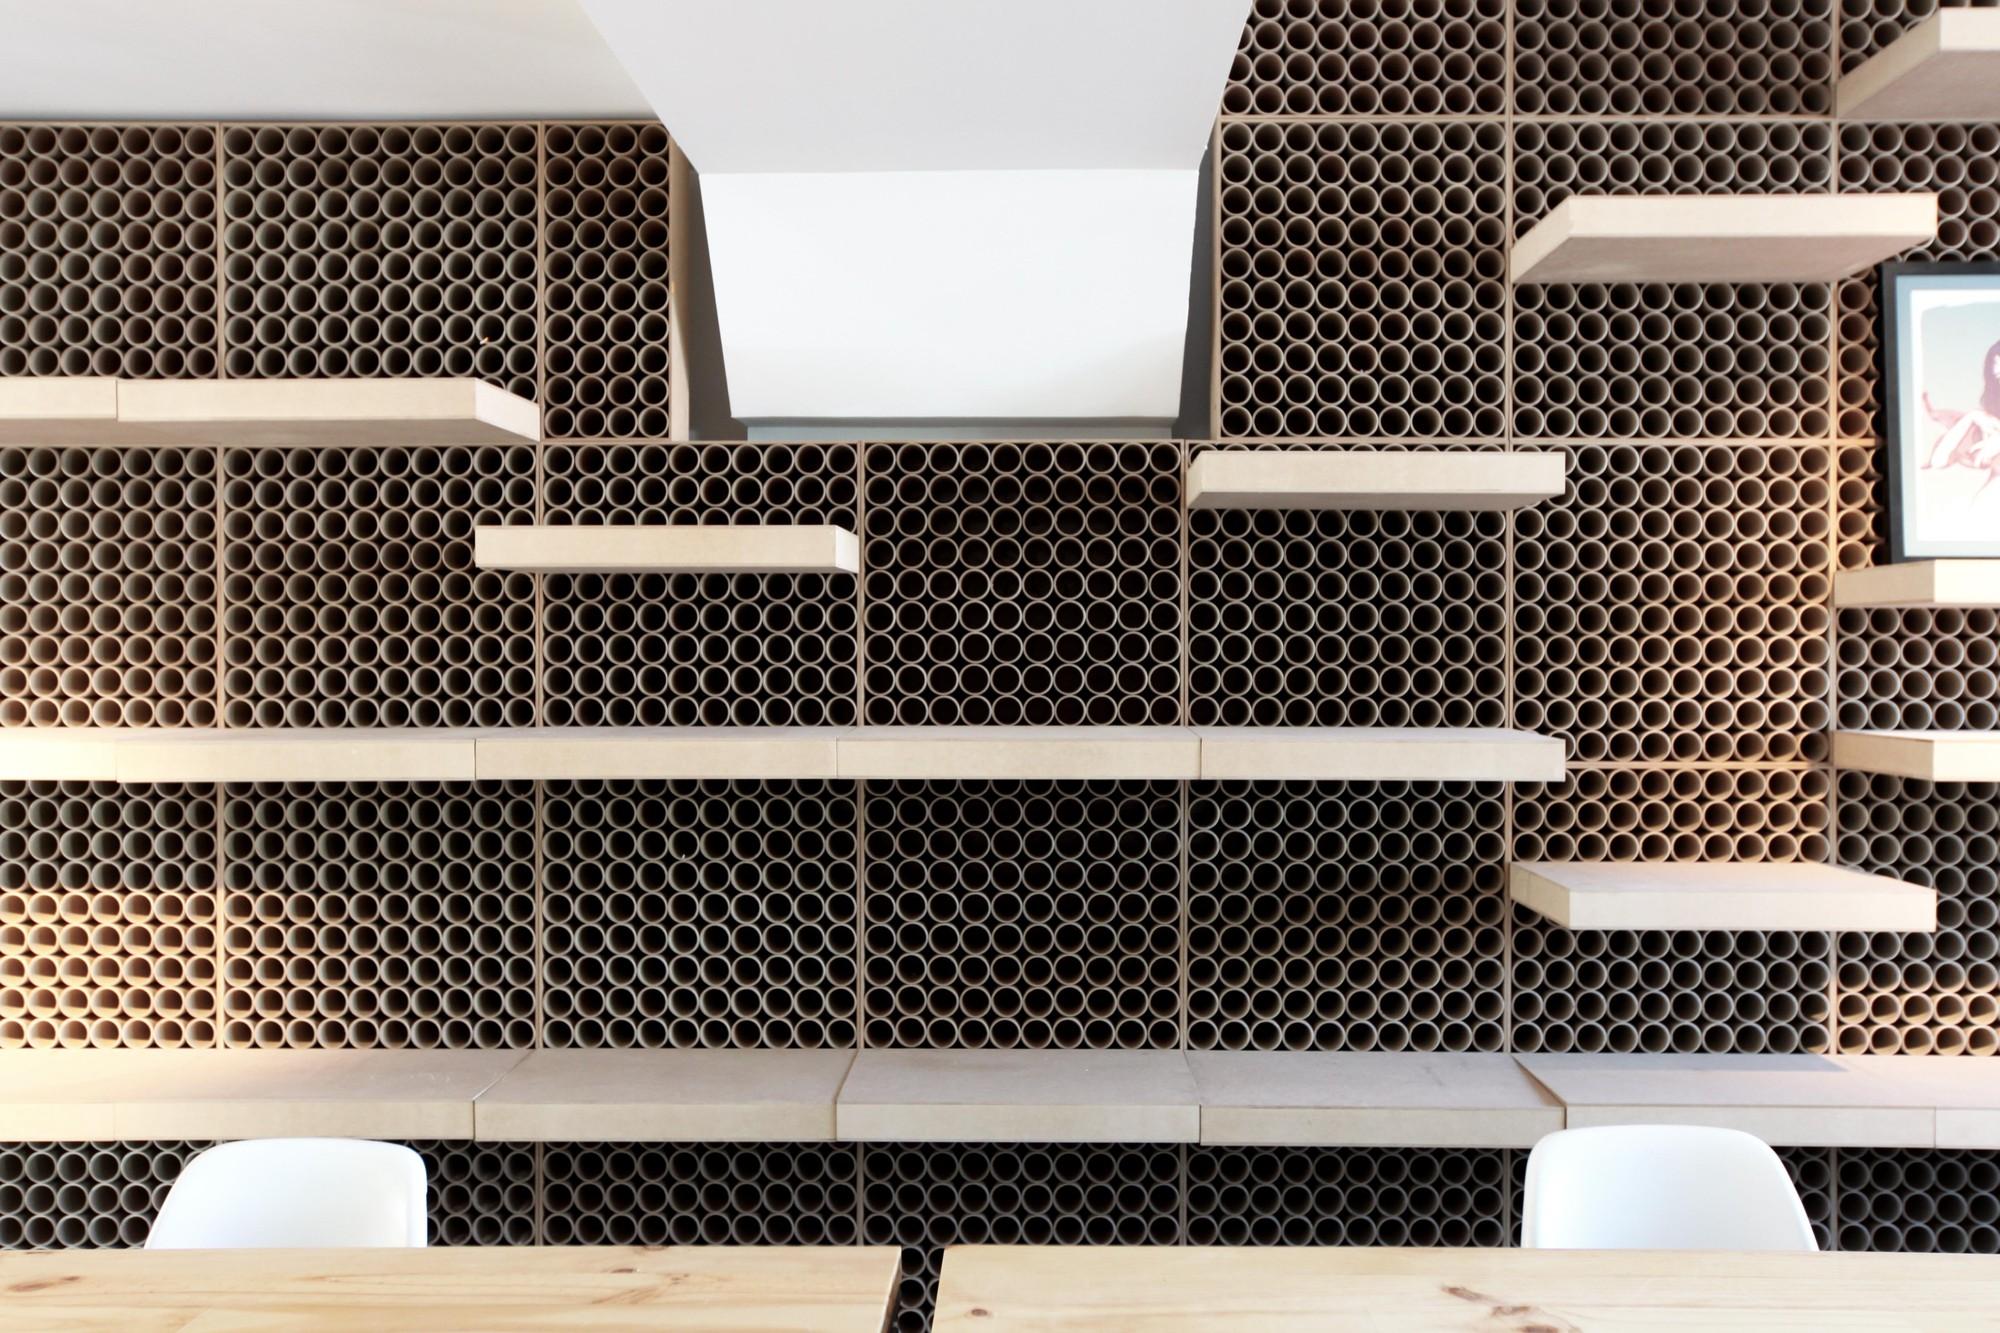 Dr. York / DCPP Architects, Courtesy of DCPP